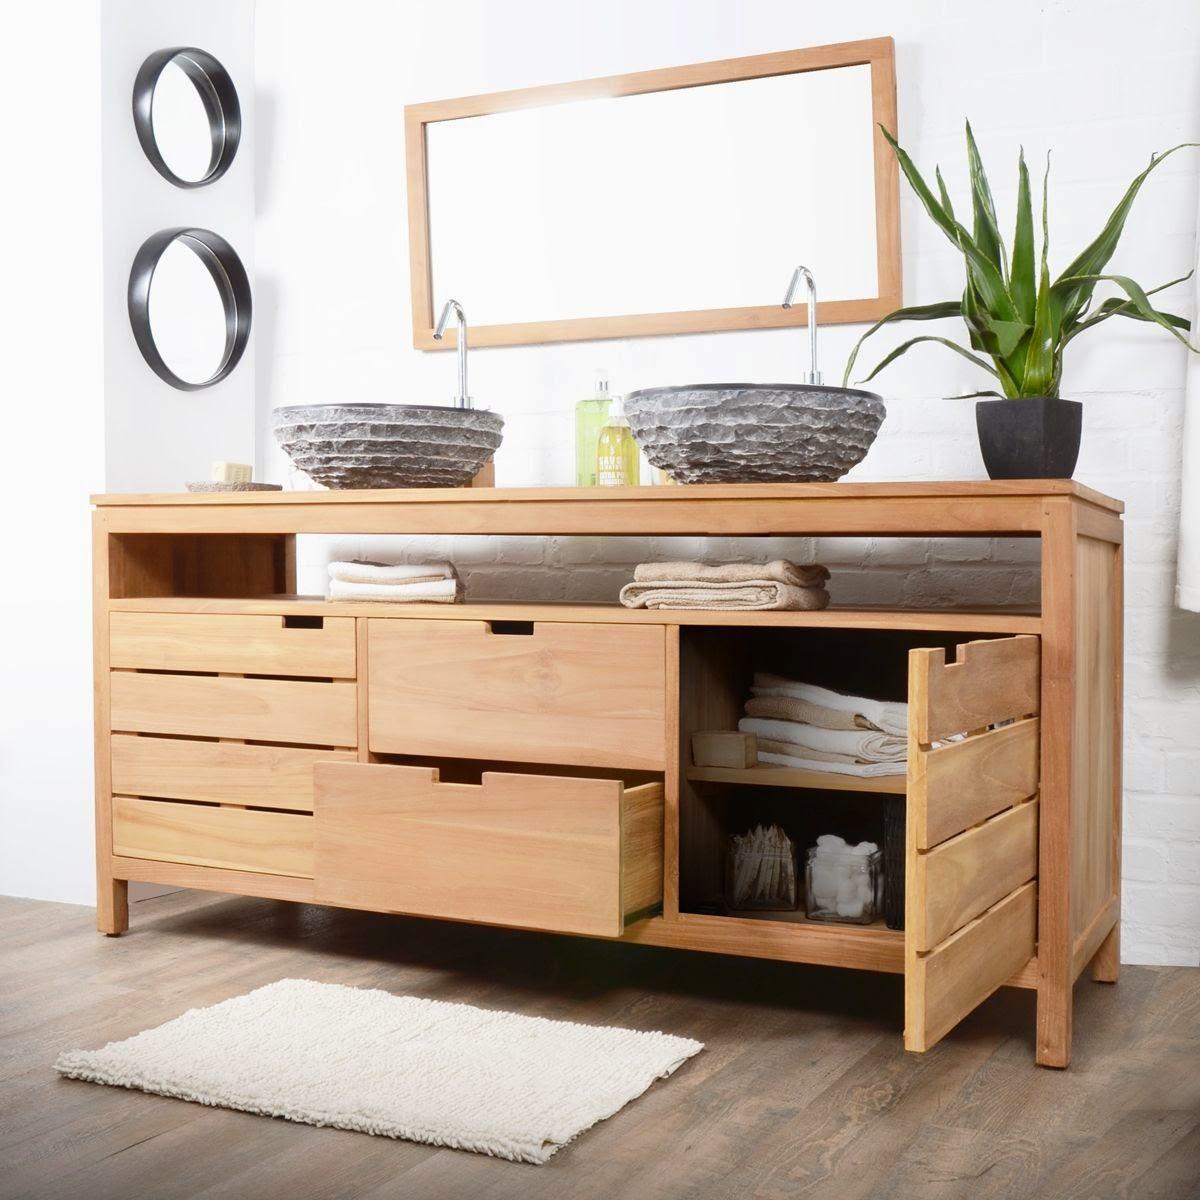 Meuble salle de bain bois 2 vasques meuble d coration maison - Meuble de salle de bains en bois ...